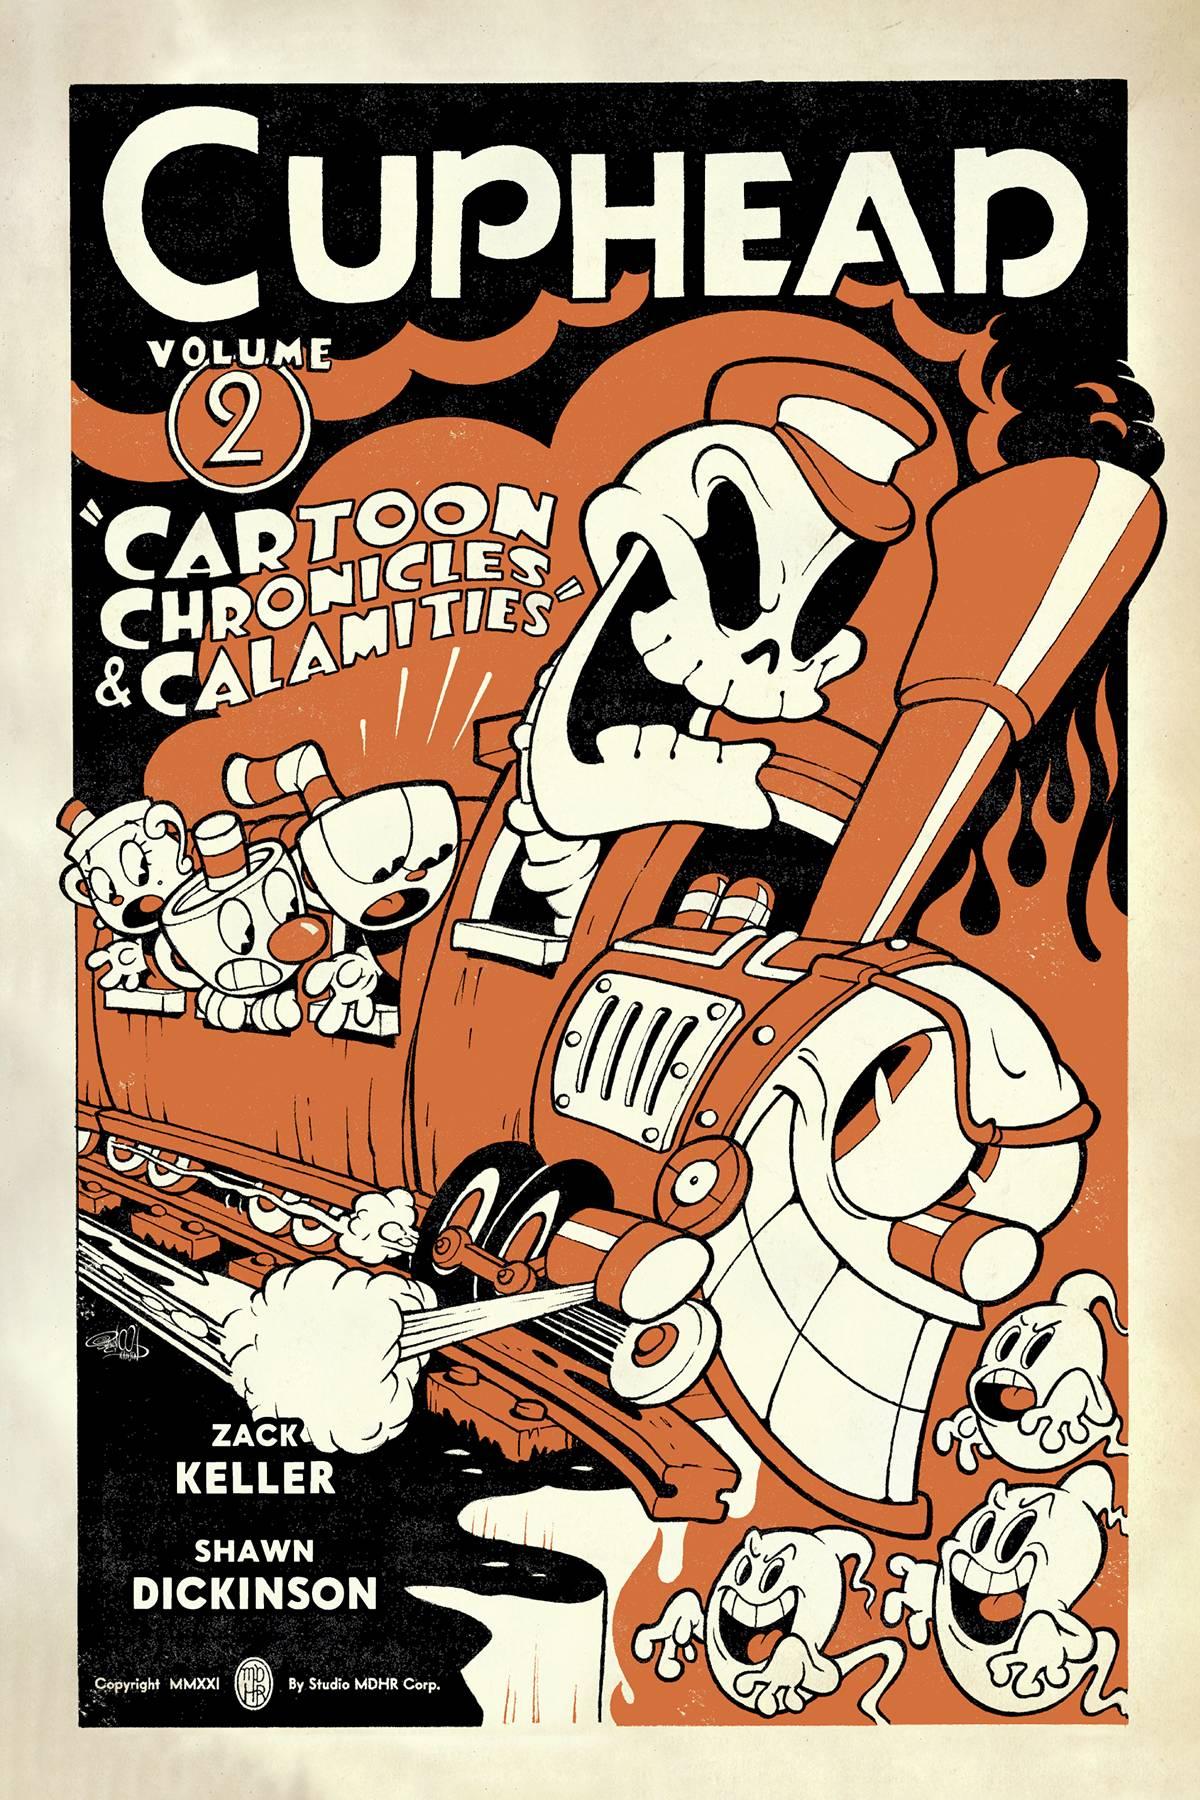 CUPHEAD TP 02 CARTOON CHRONICLES & CALAMITIES